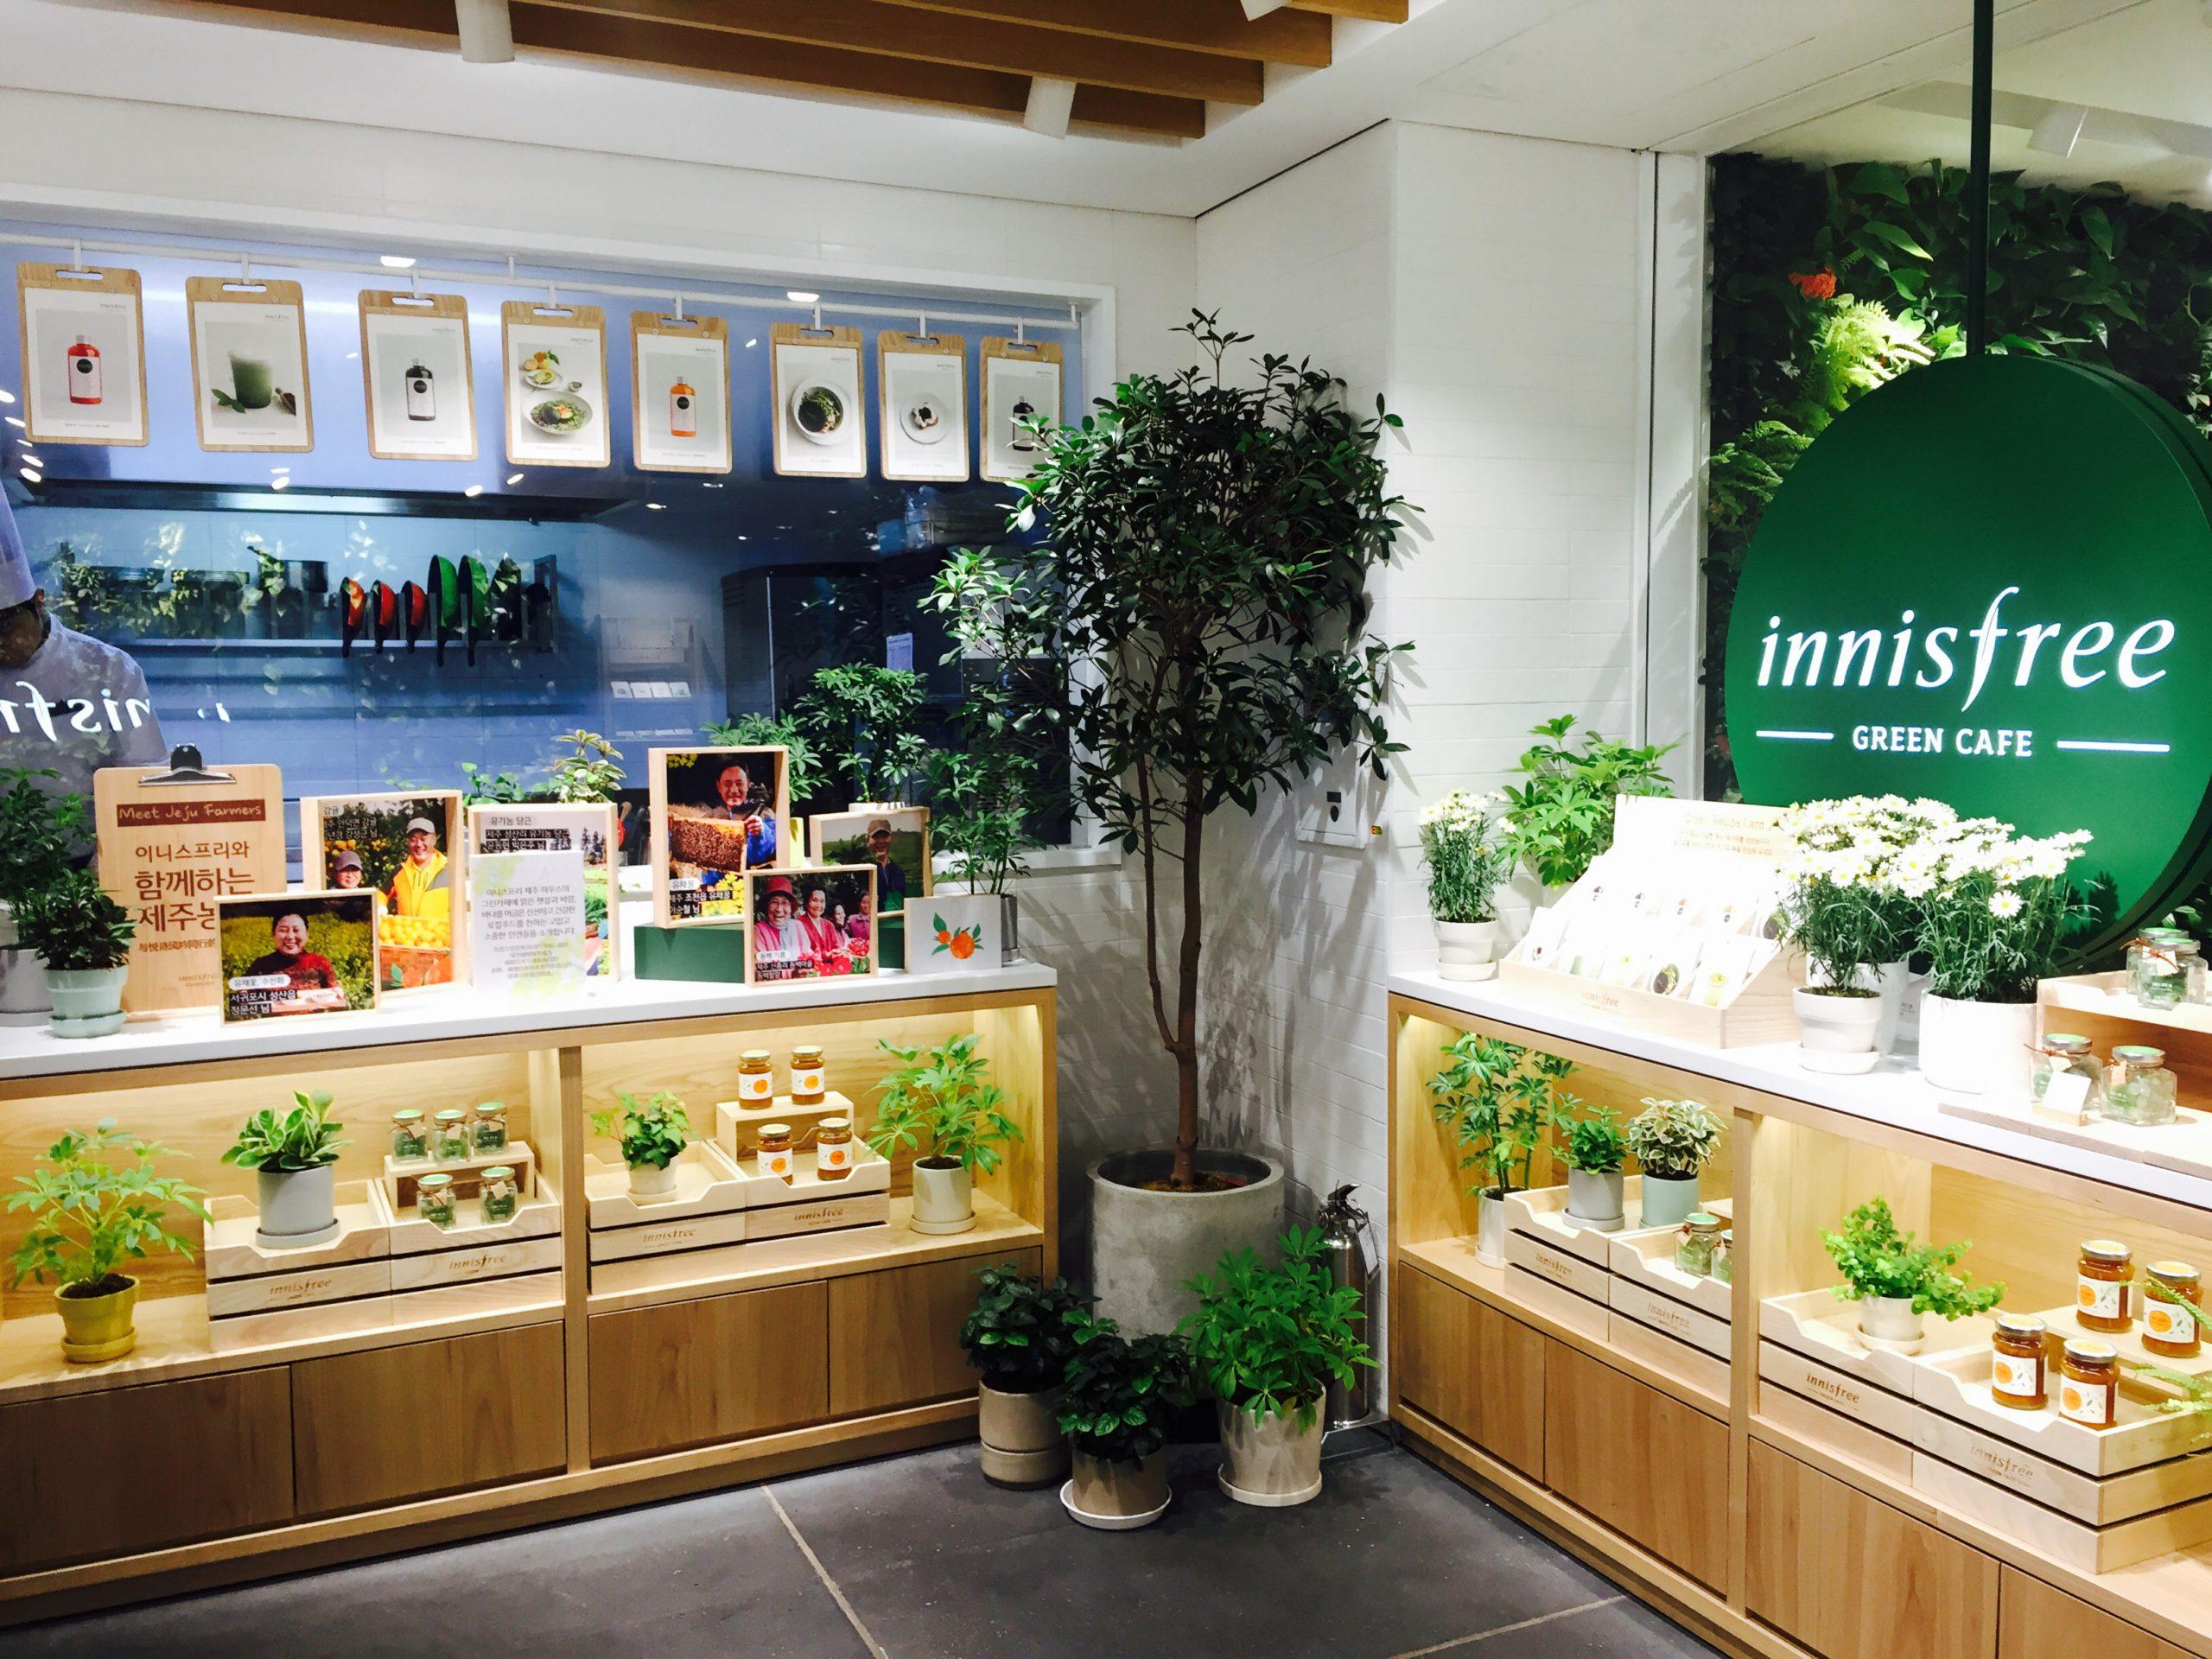 innisfree Green Cafe in Seoul